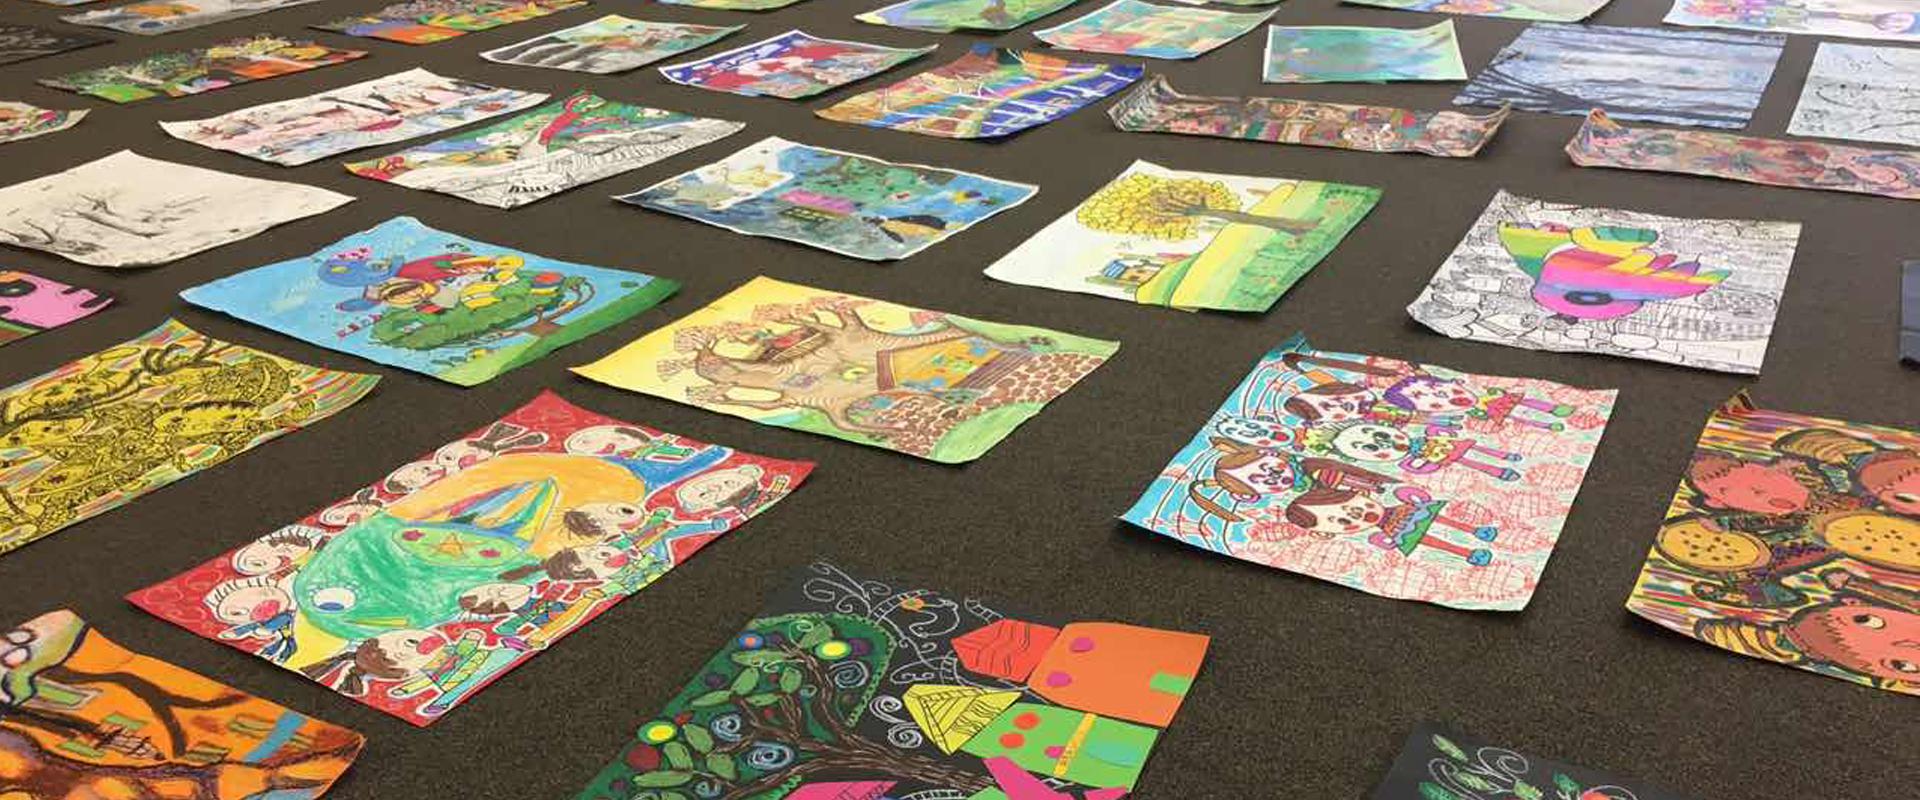 2018 Canada International Children's Art Festival